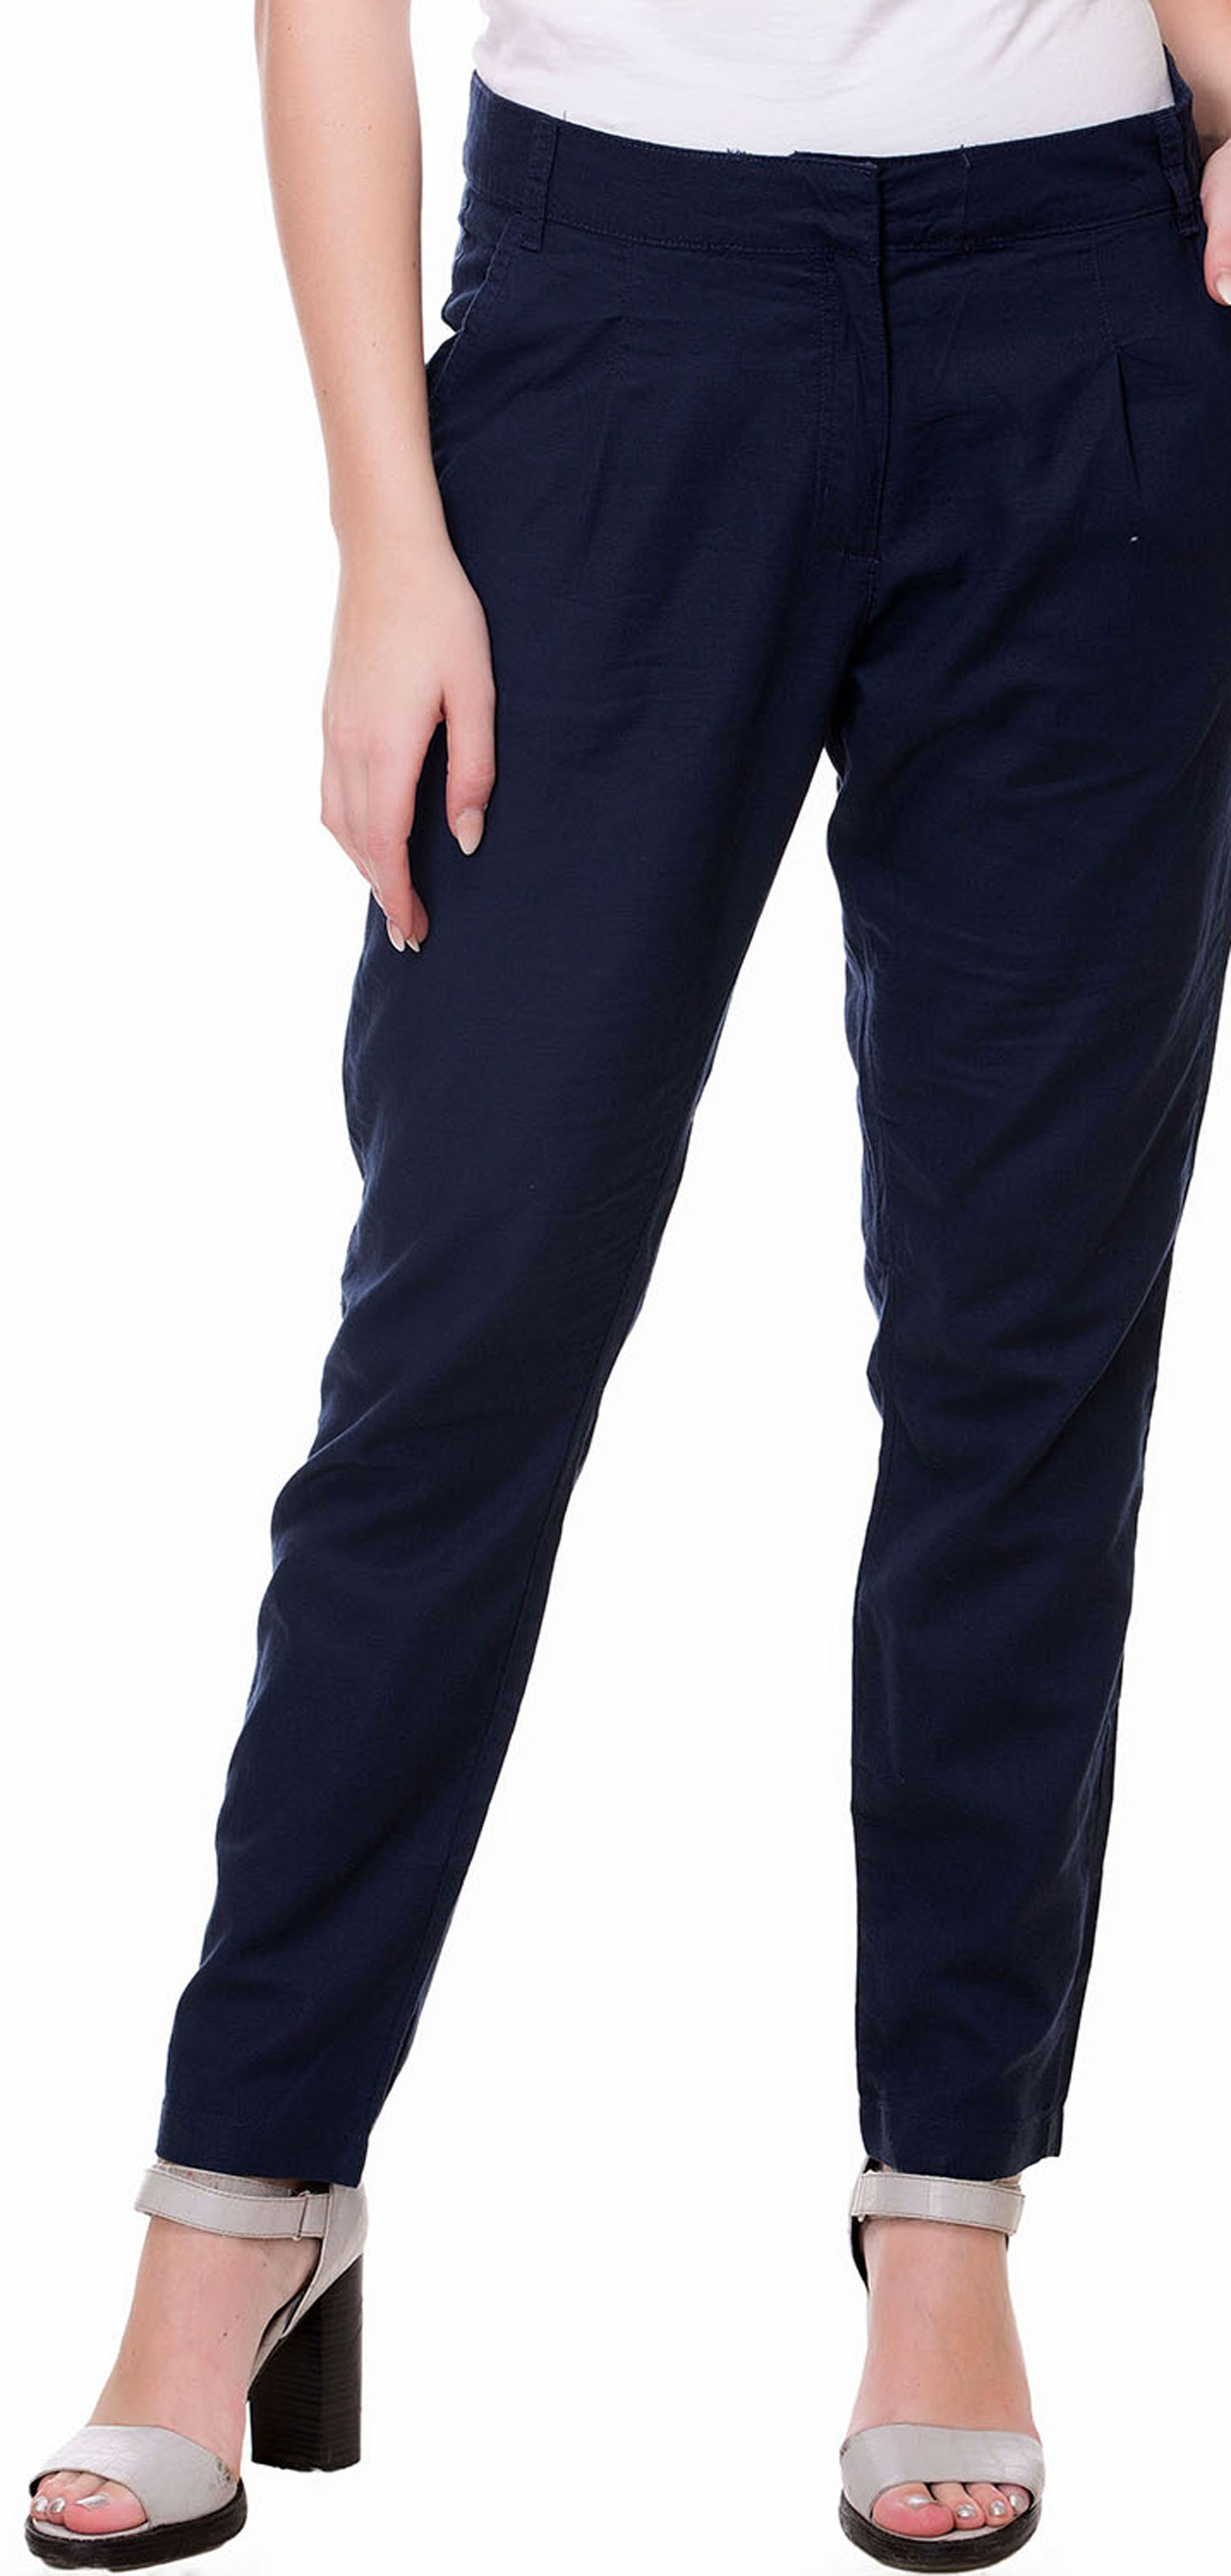 Kotty Regular Fit Women's Linen Dark Blue Trousers